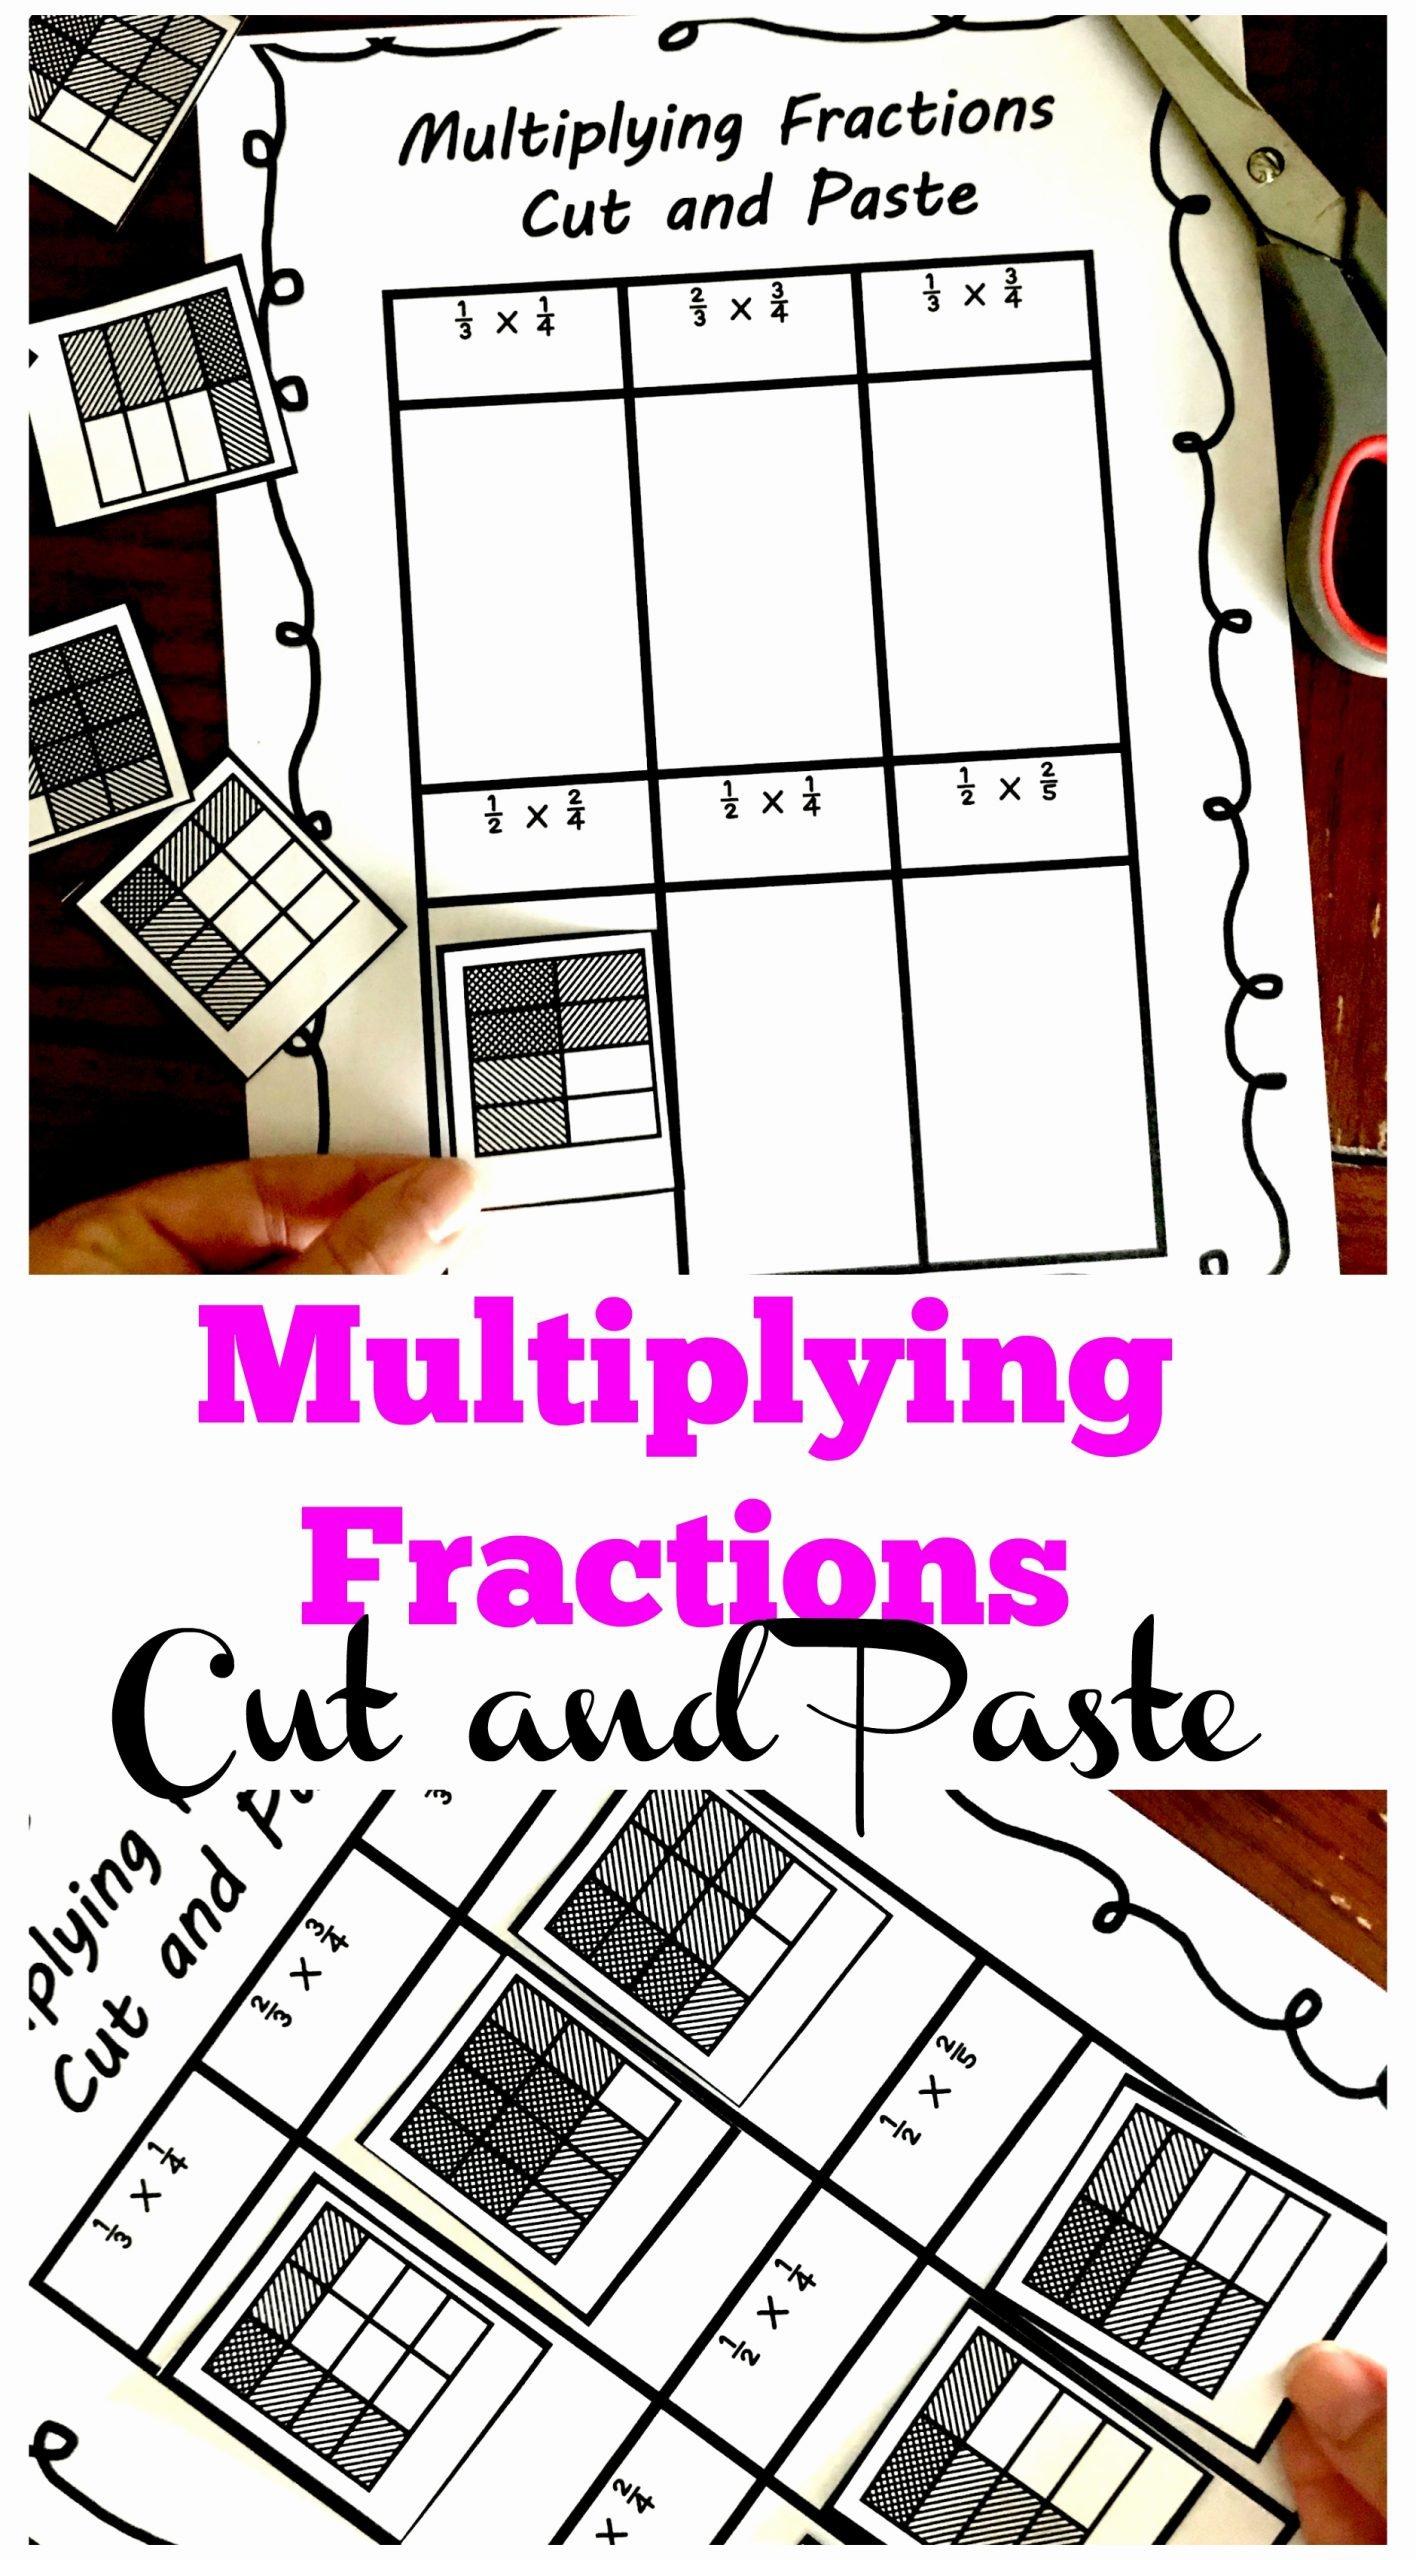 Multiplying Fractions area Model Worksheet Fresh 3 Cut and Paste Worksheets for Multiplying Fractions Practice